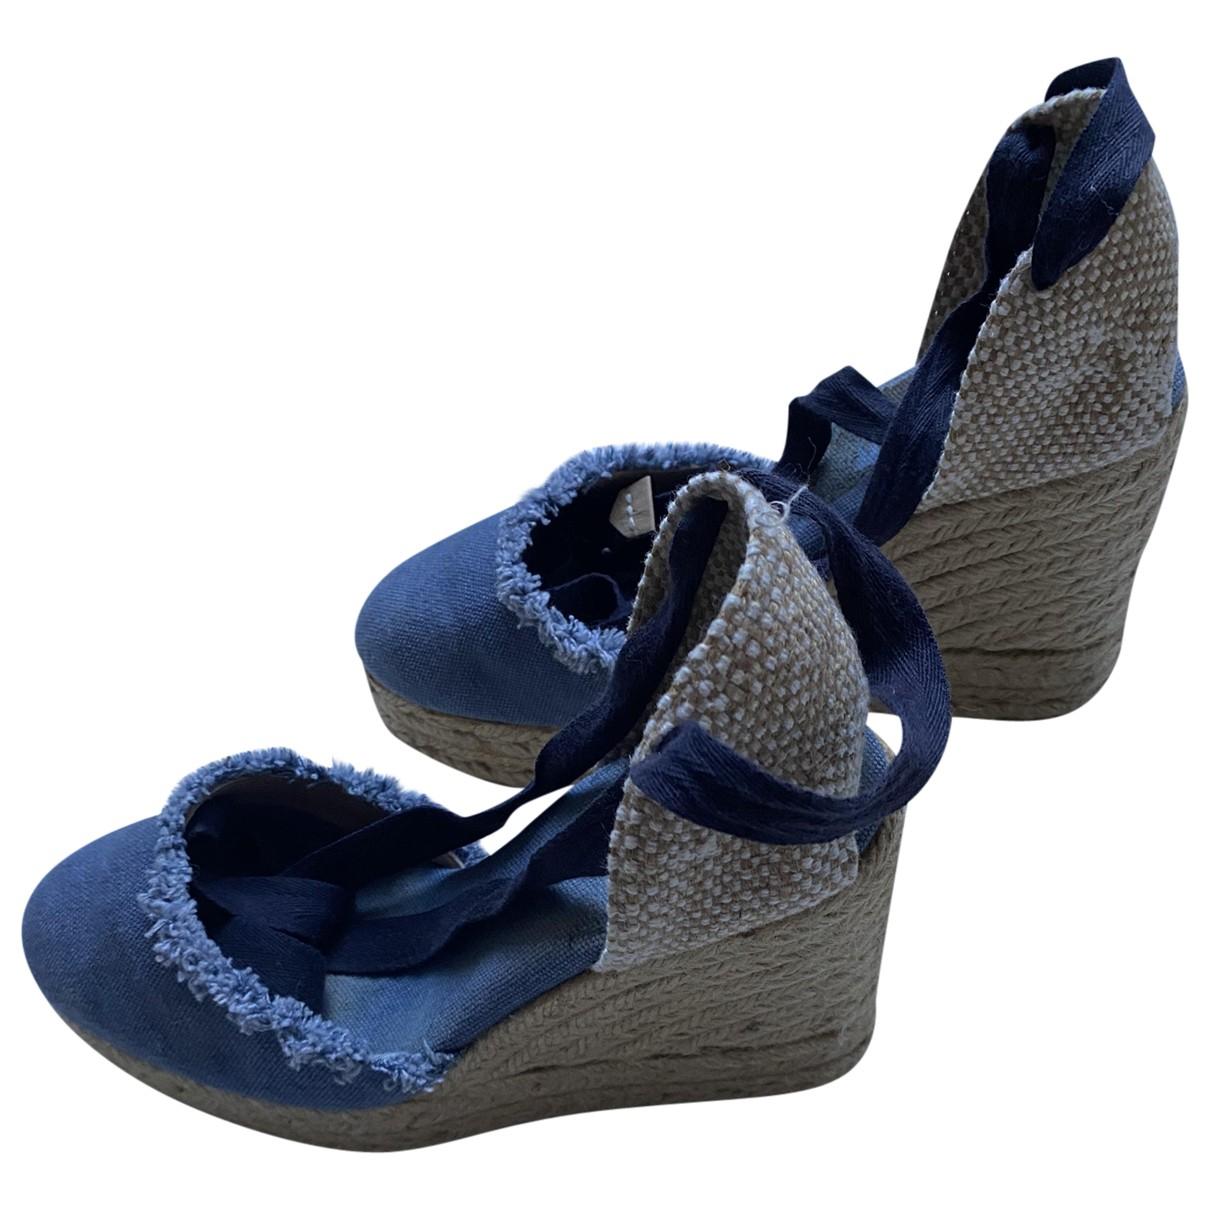 Castaner \N Espadrilles in  Blau Denim - Jeans